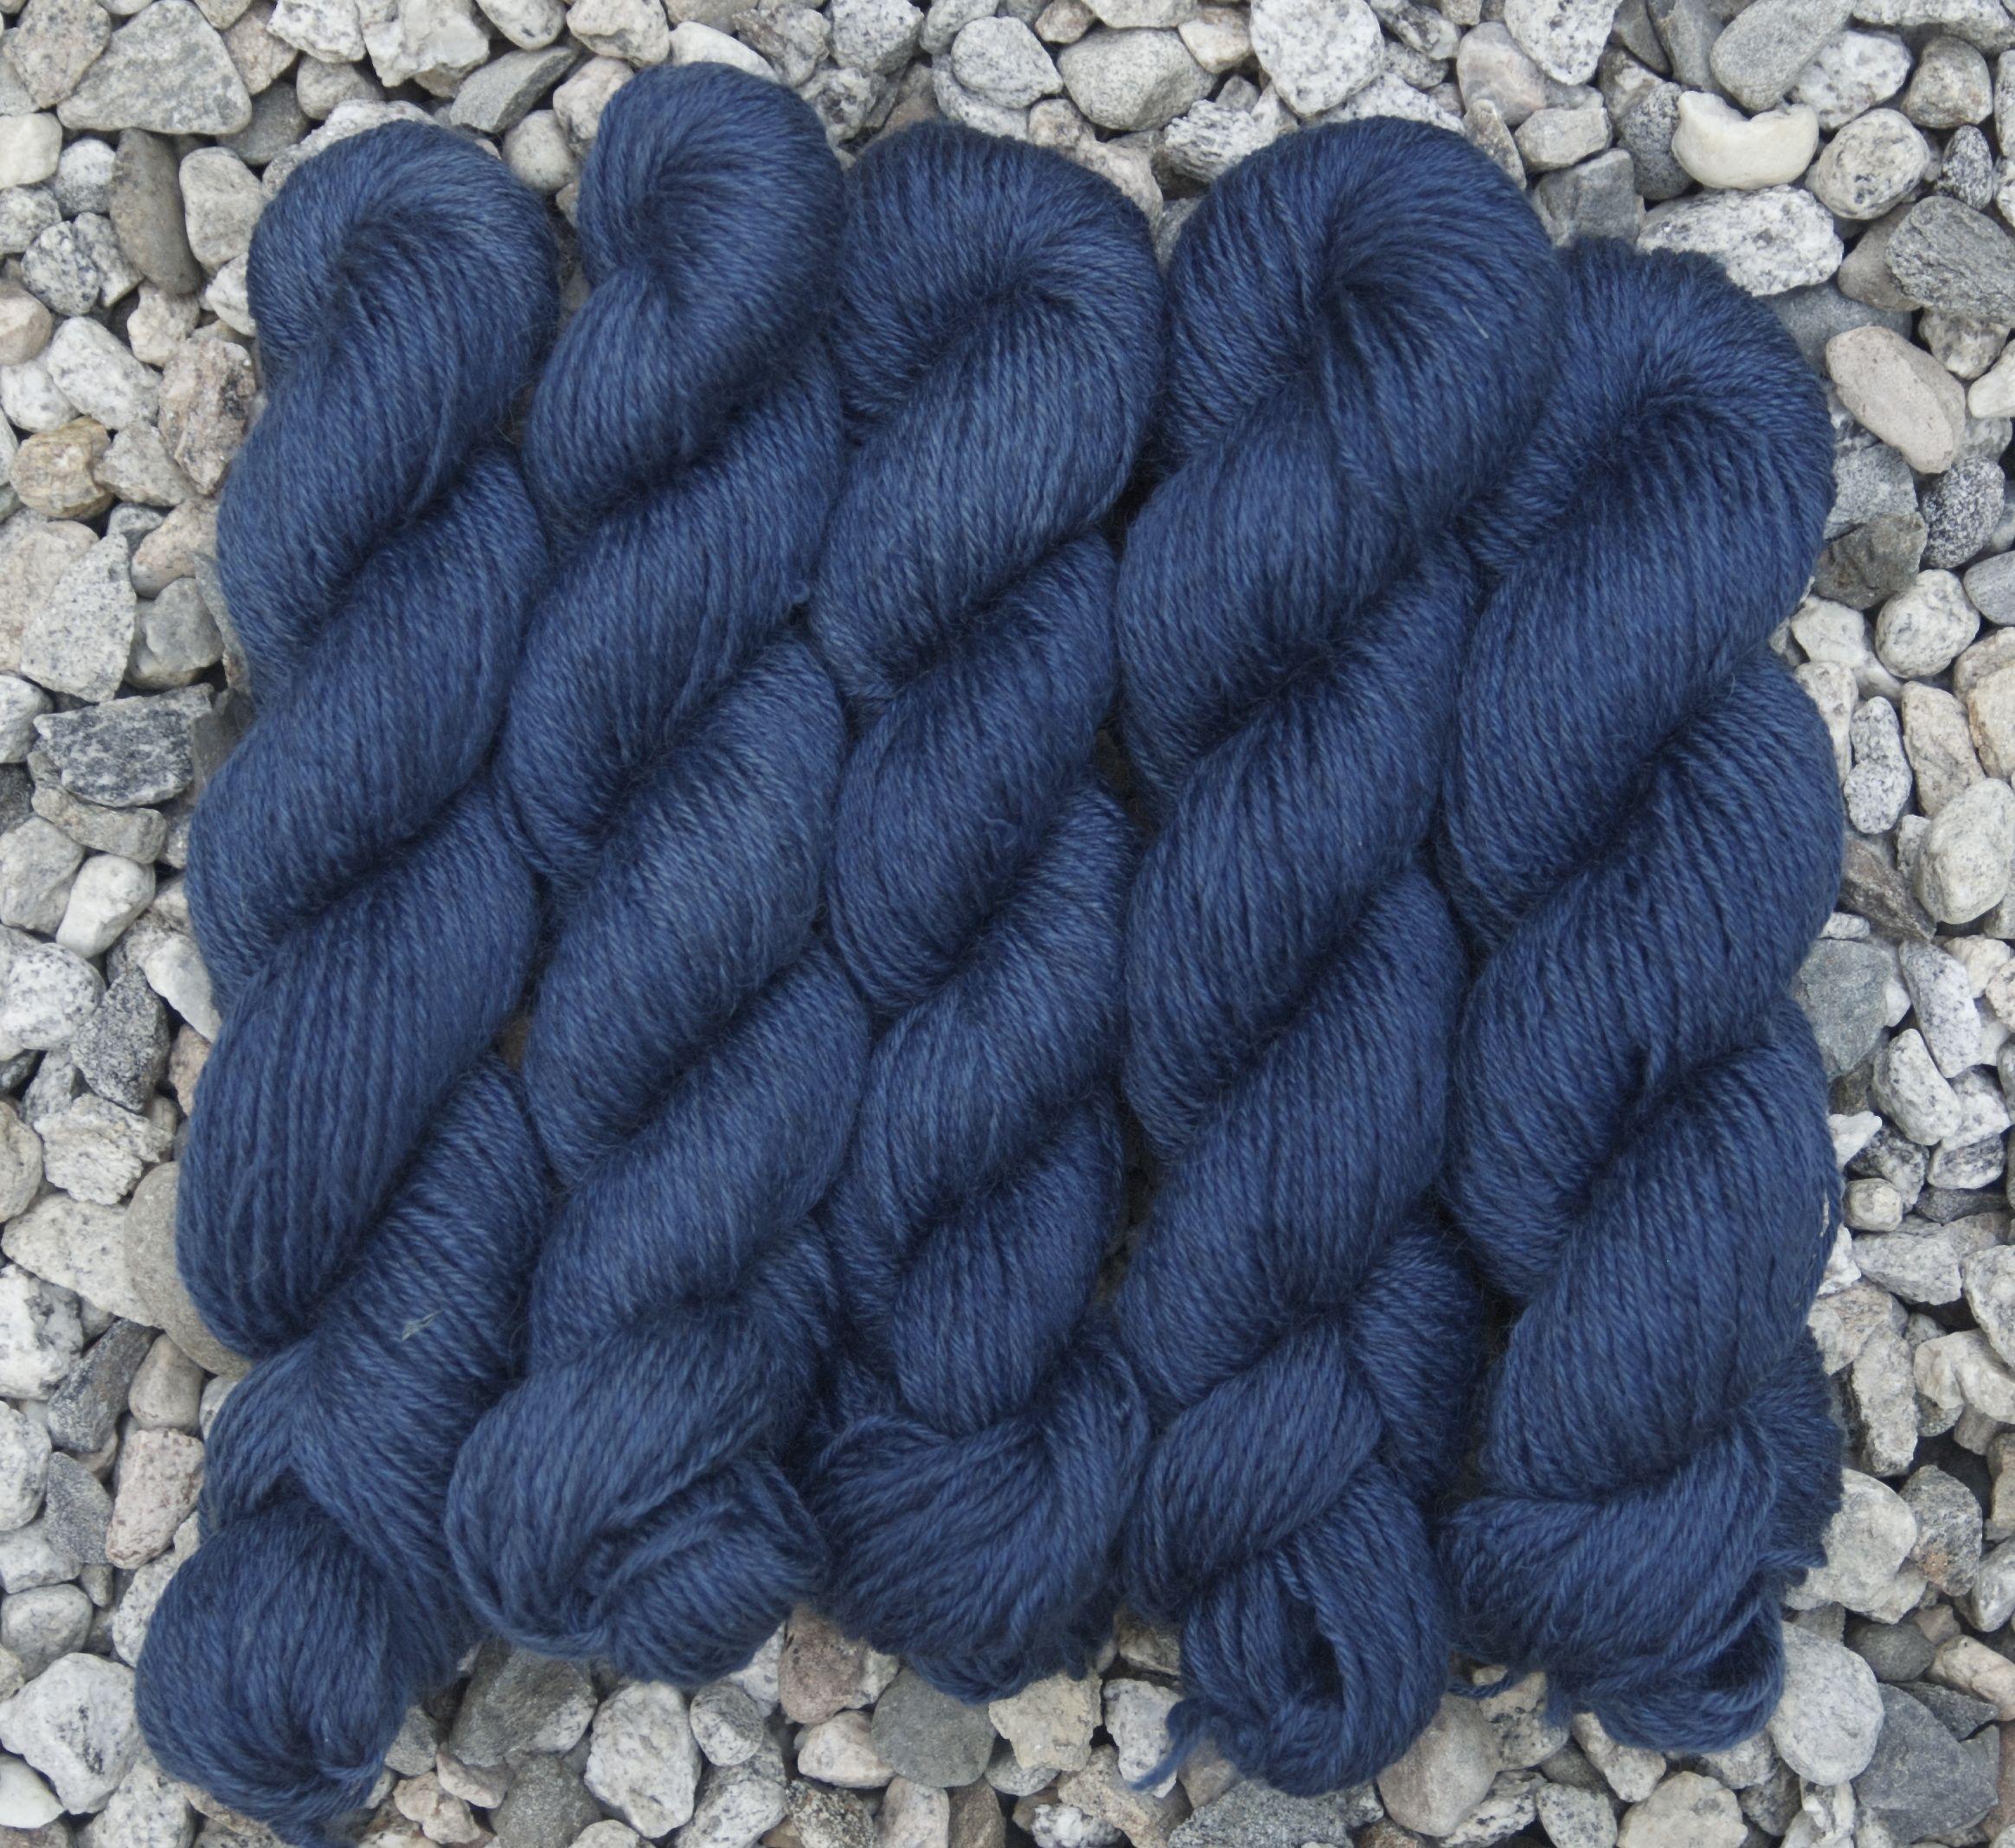 5 - Ply Coopworth Gansey Yarn in Frederick Sound